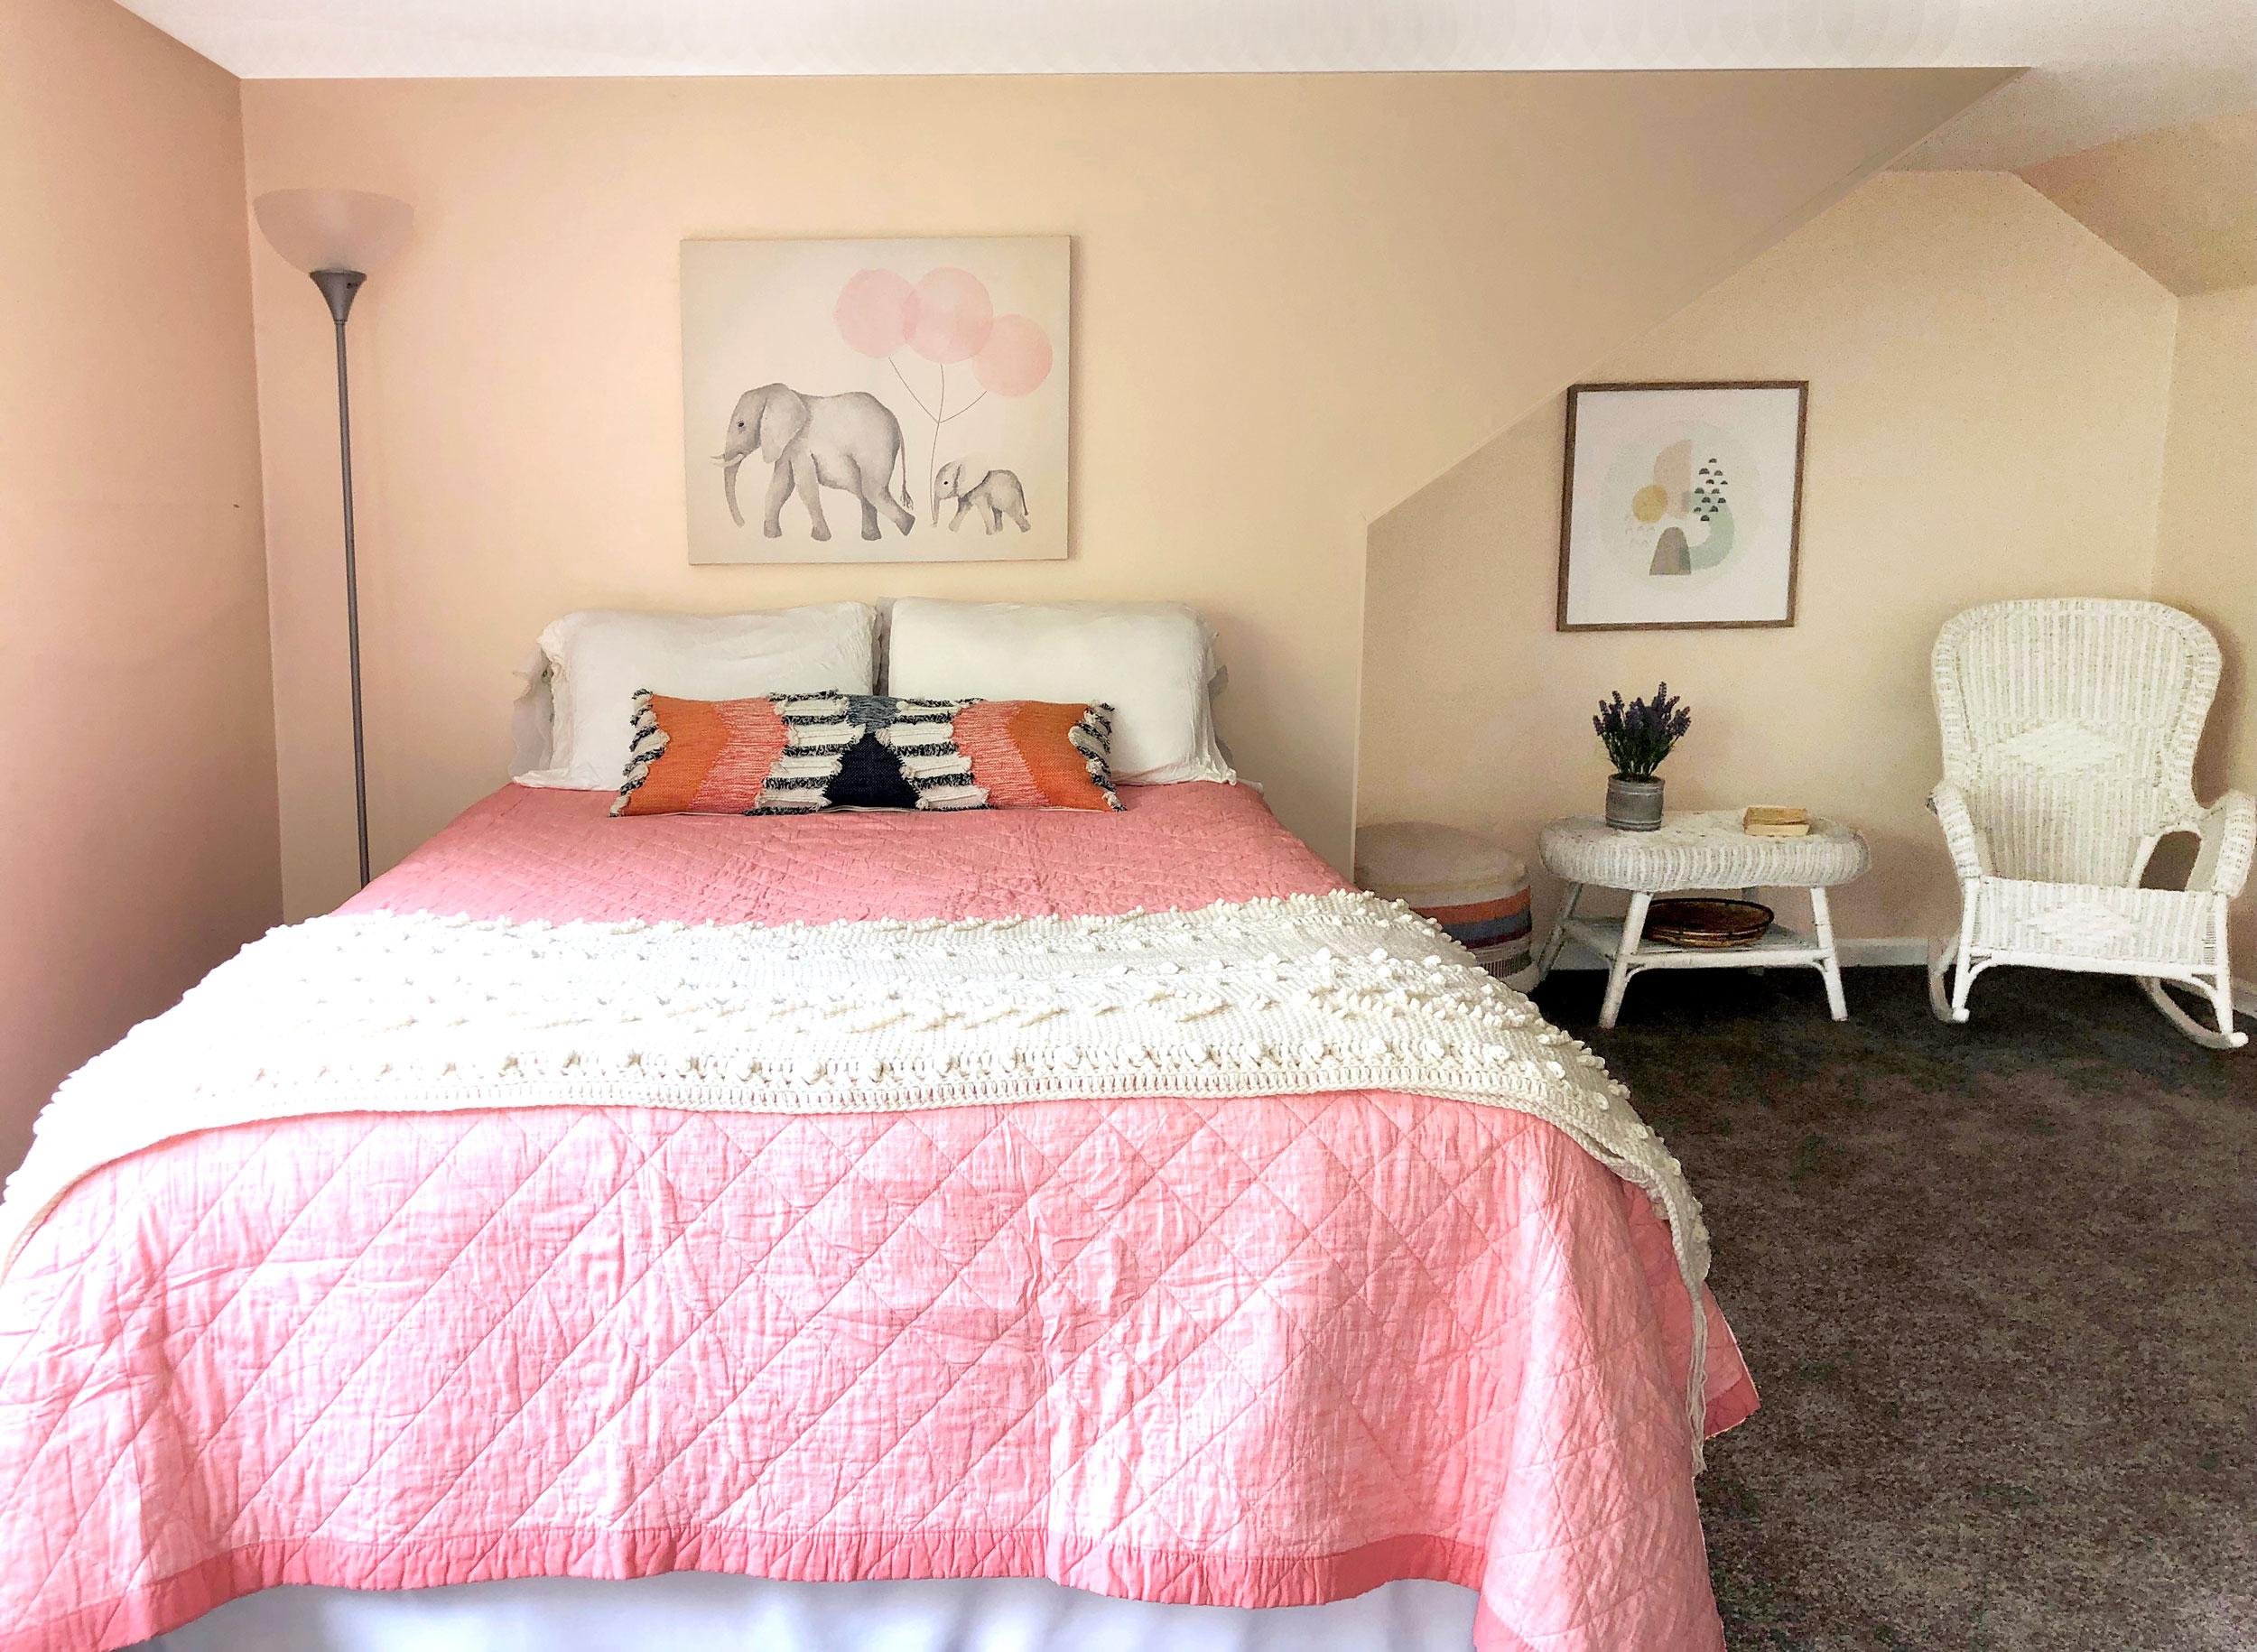 Bedroom: After